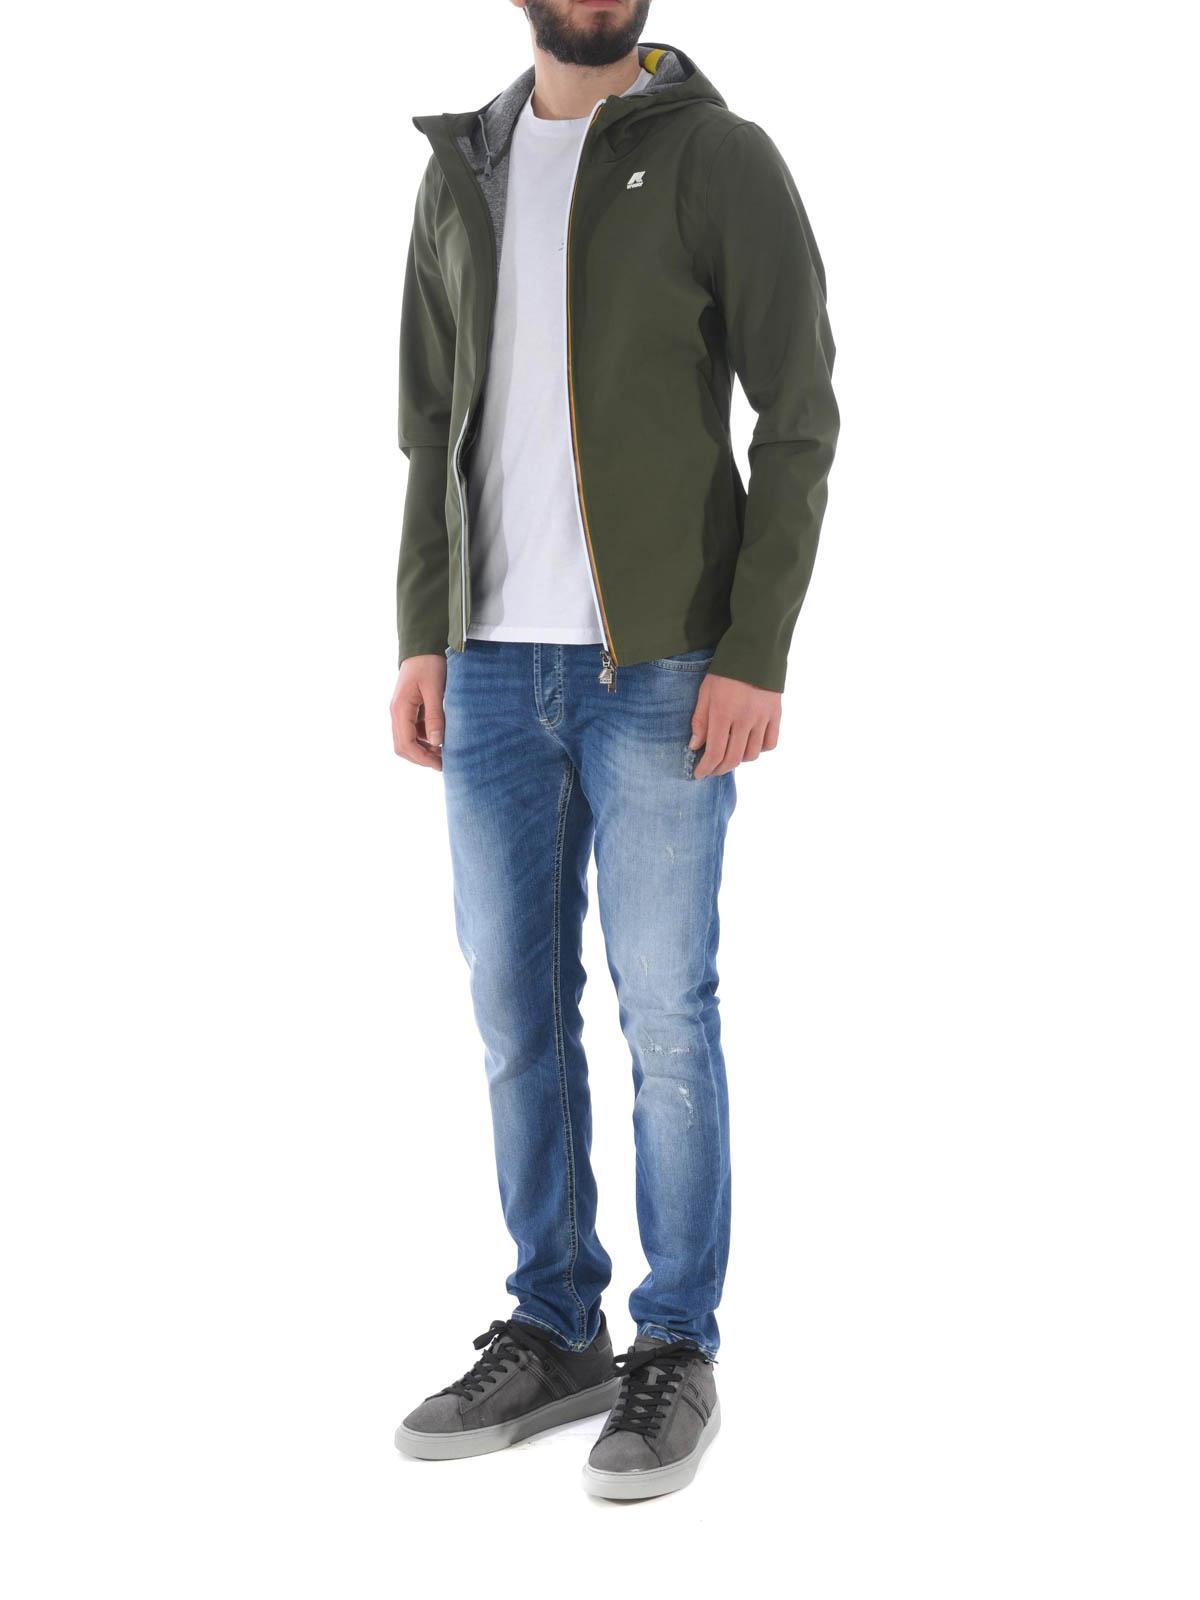 usine authentique chaussures de course se connecter K-way - Jack Bonded army green jacket - casual jackets - K007LV0 576